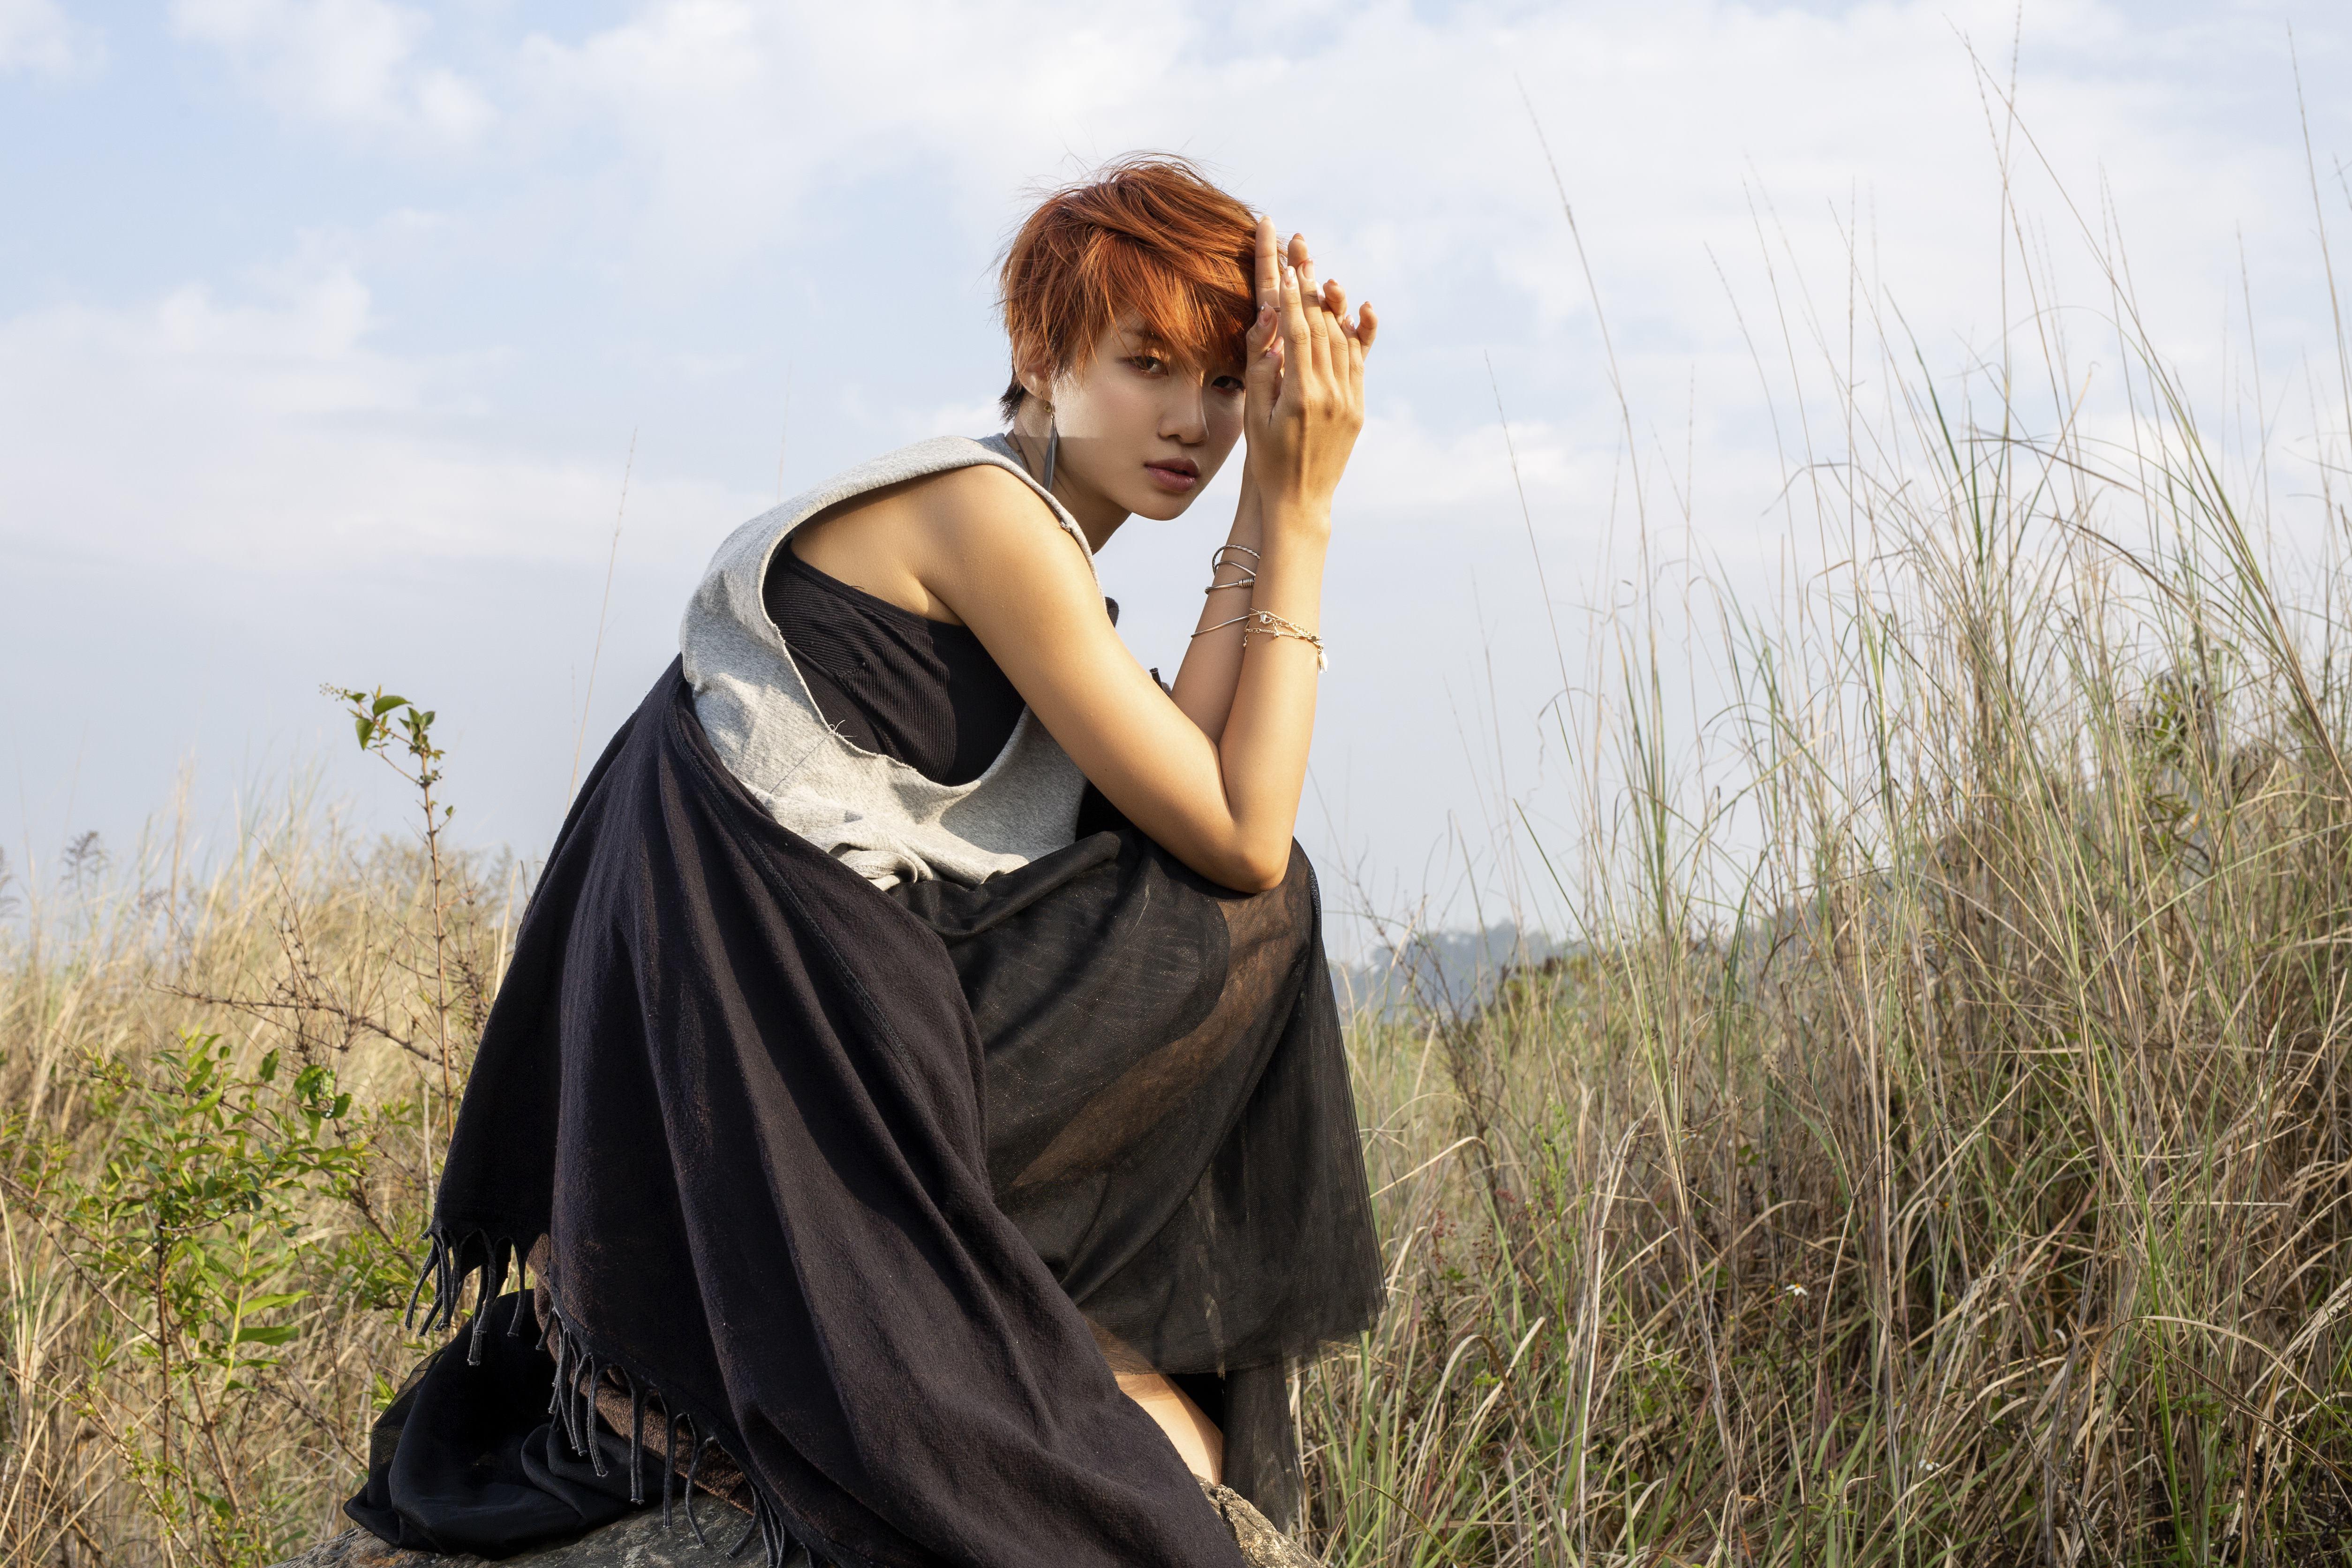 illumiphoto,一路有你,fashion,portrait, Miaoli portrait, 苗栗人像,